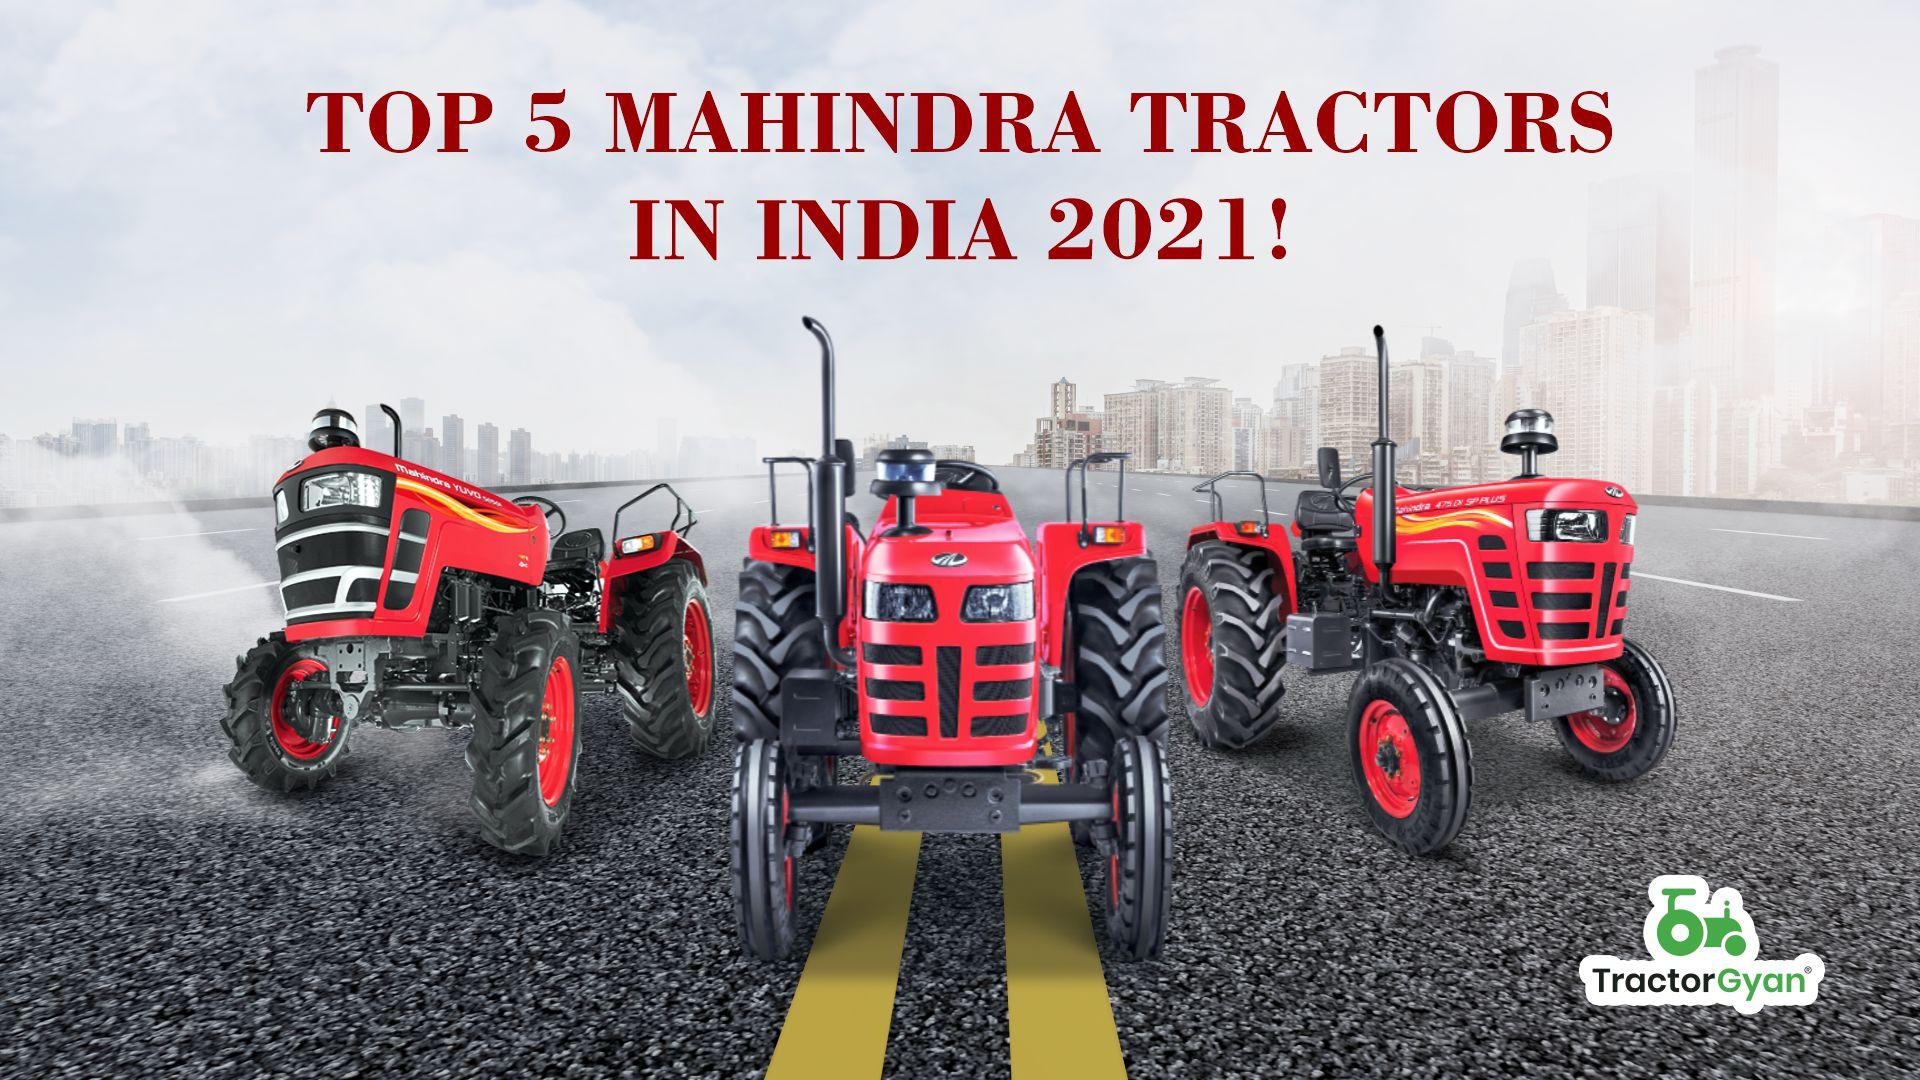 Top 5 Mahindra tractors in India 2021!